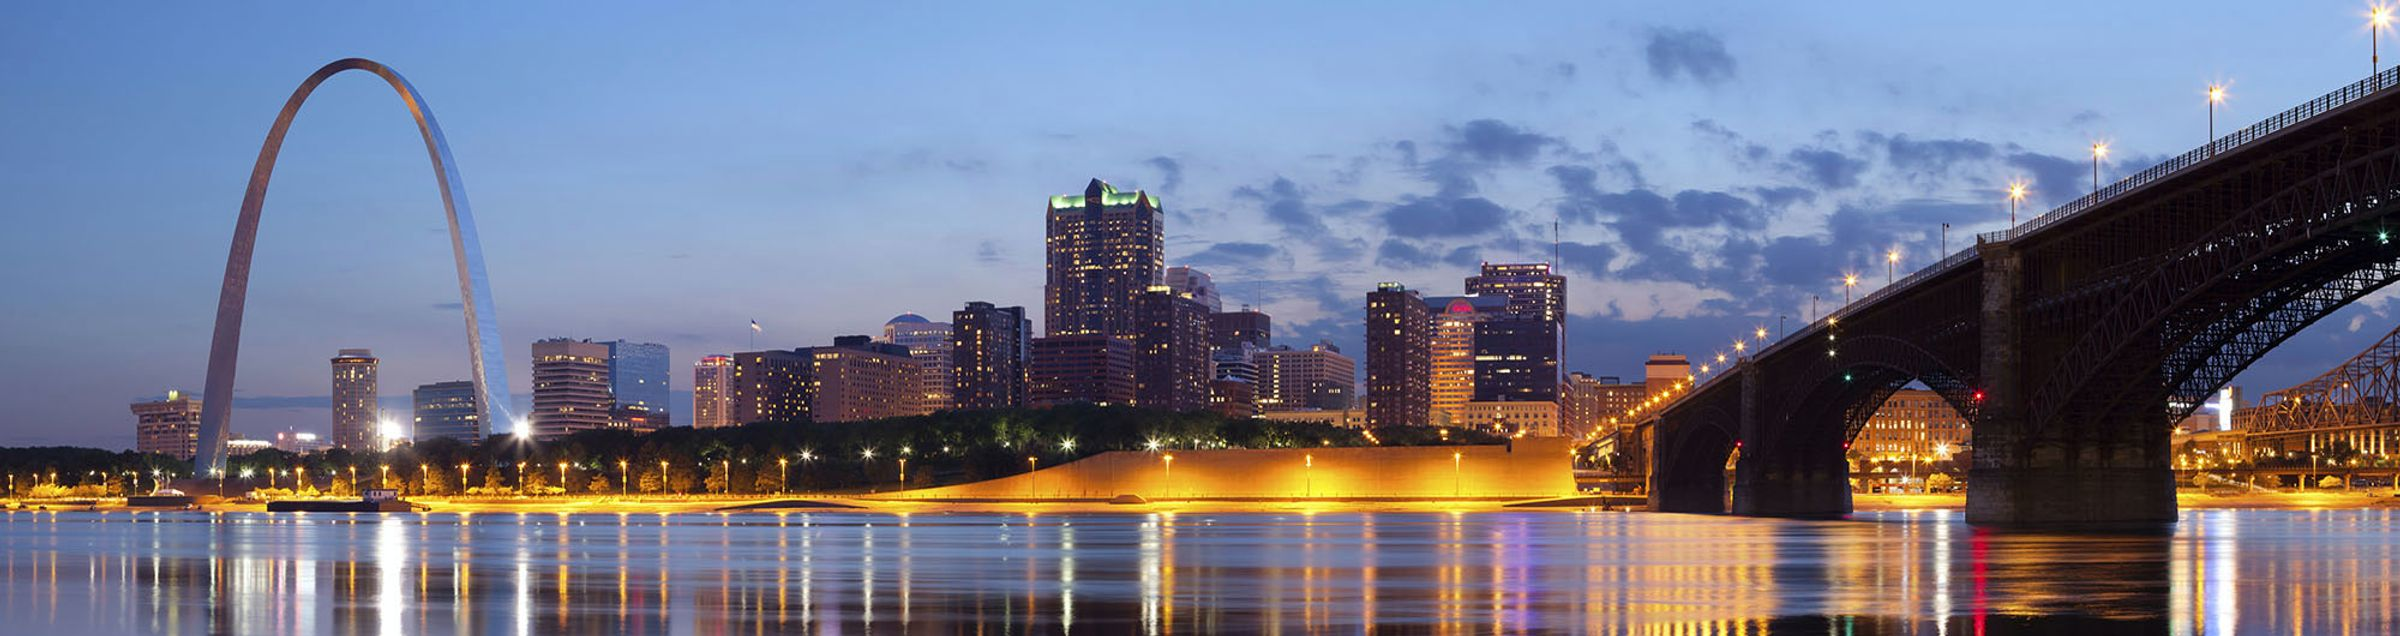 Lambert-St Louis